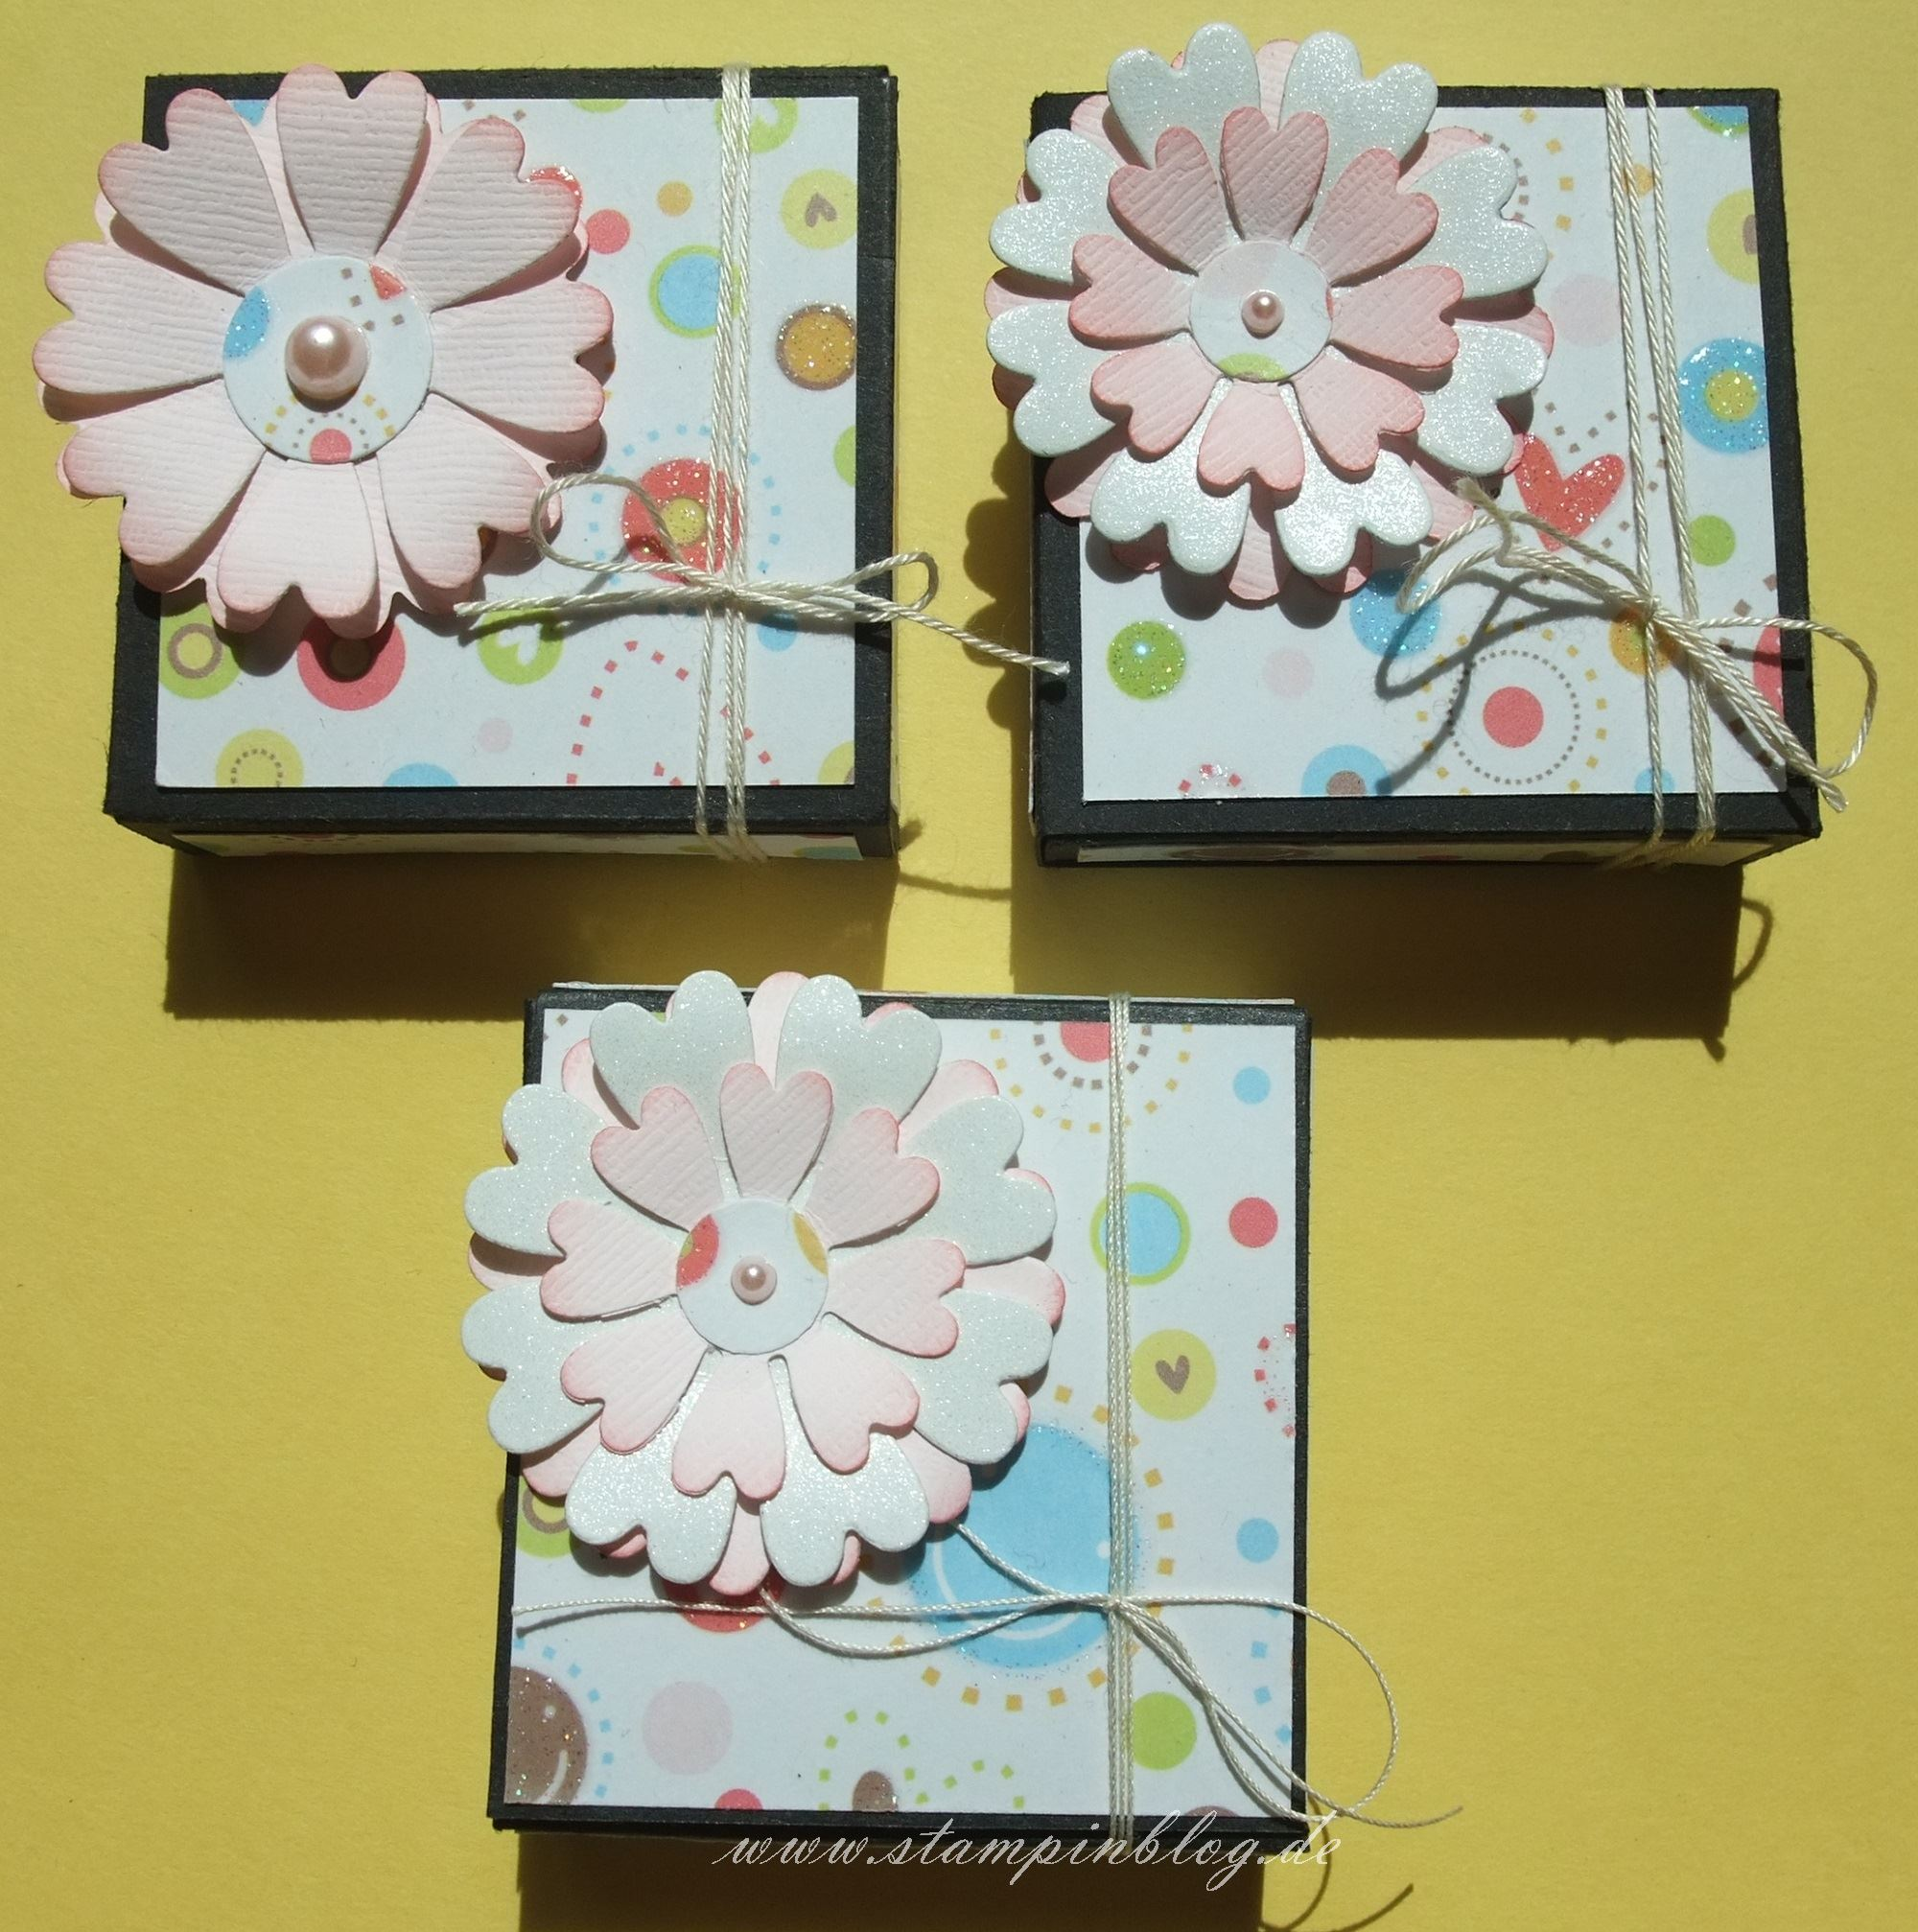 Verpackung-Rittersport-Blume-bunt-1